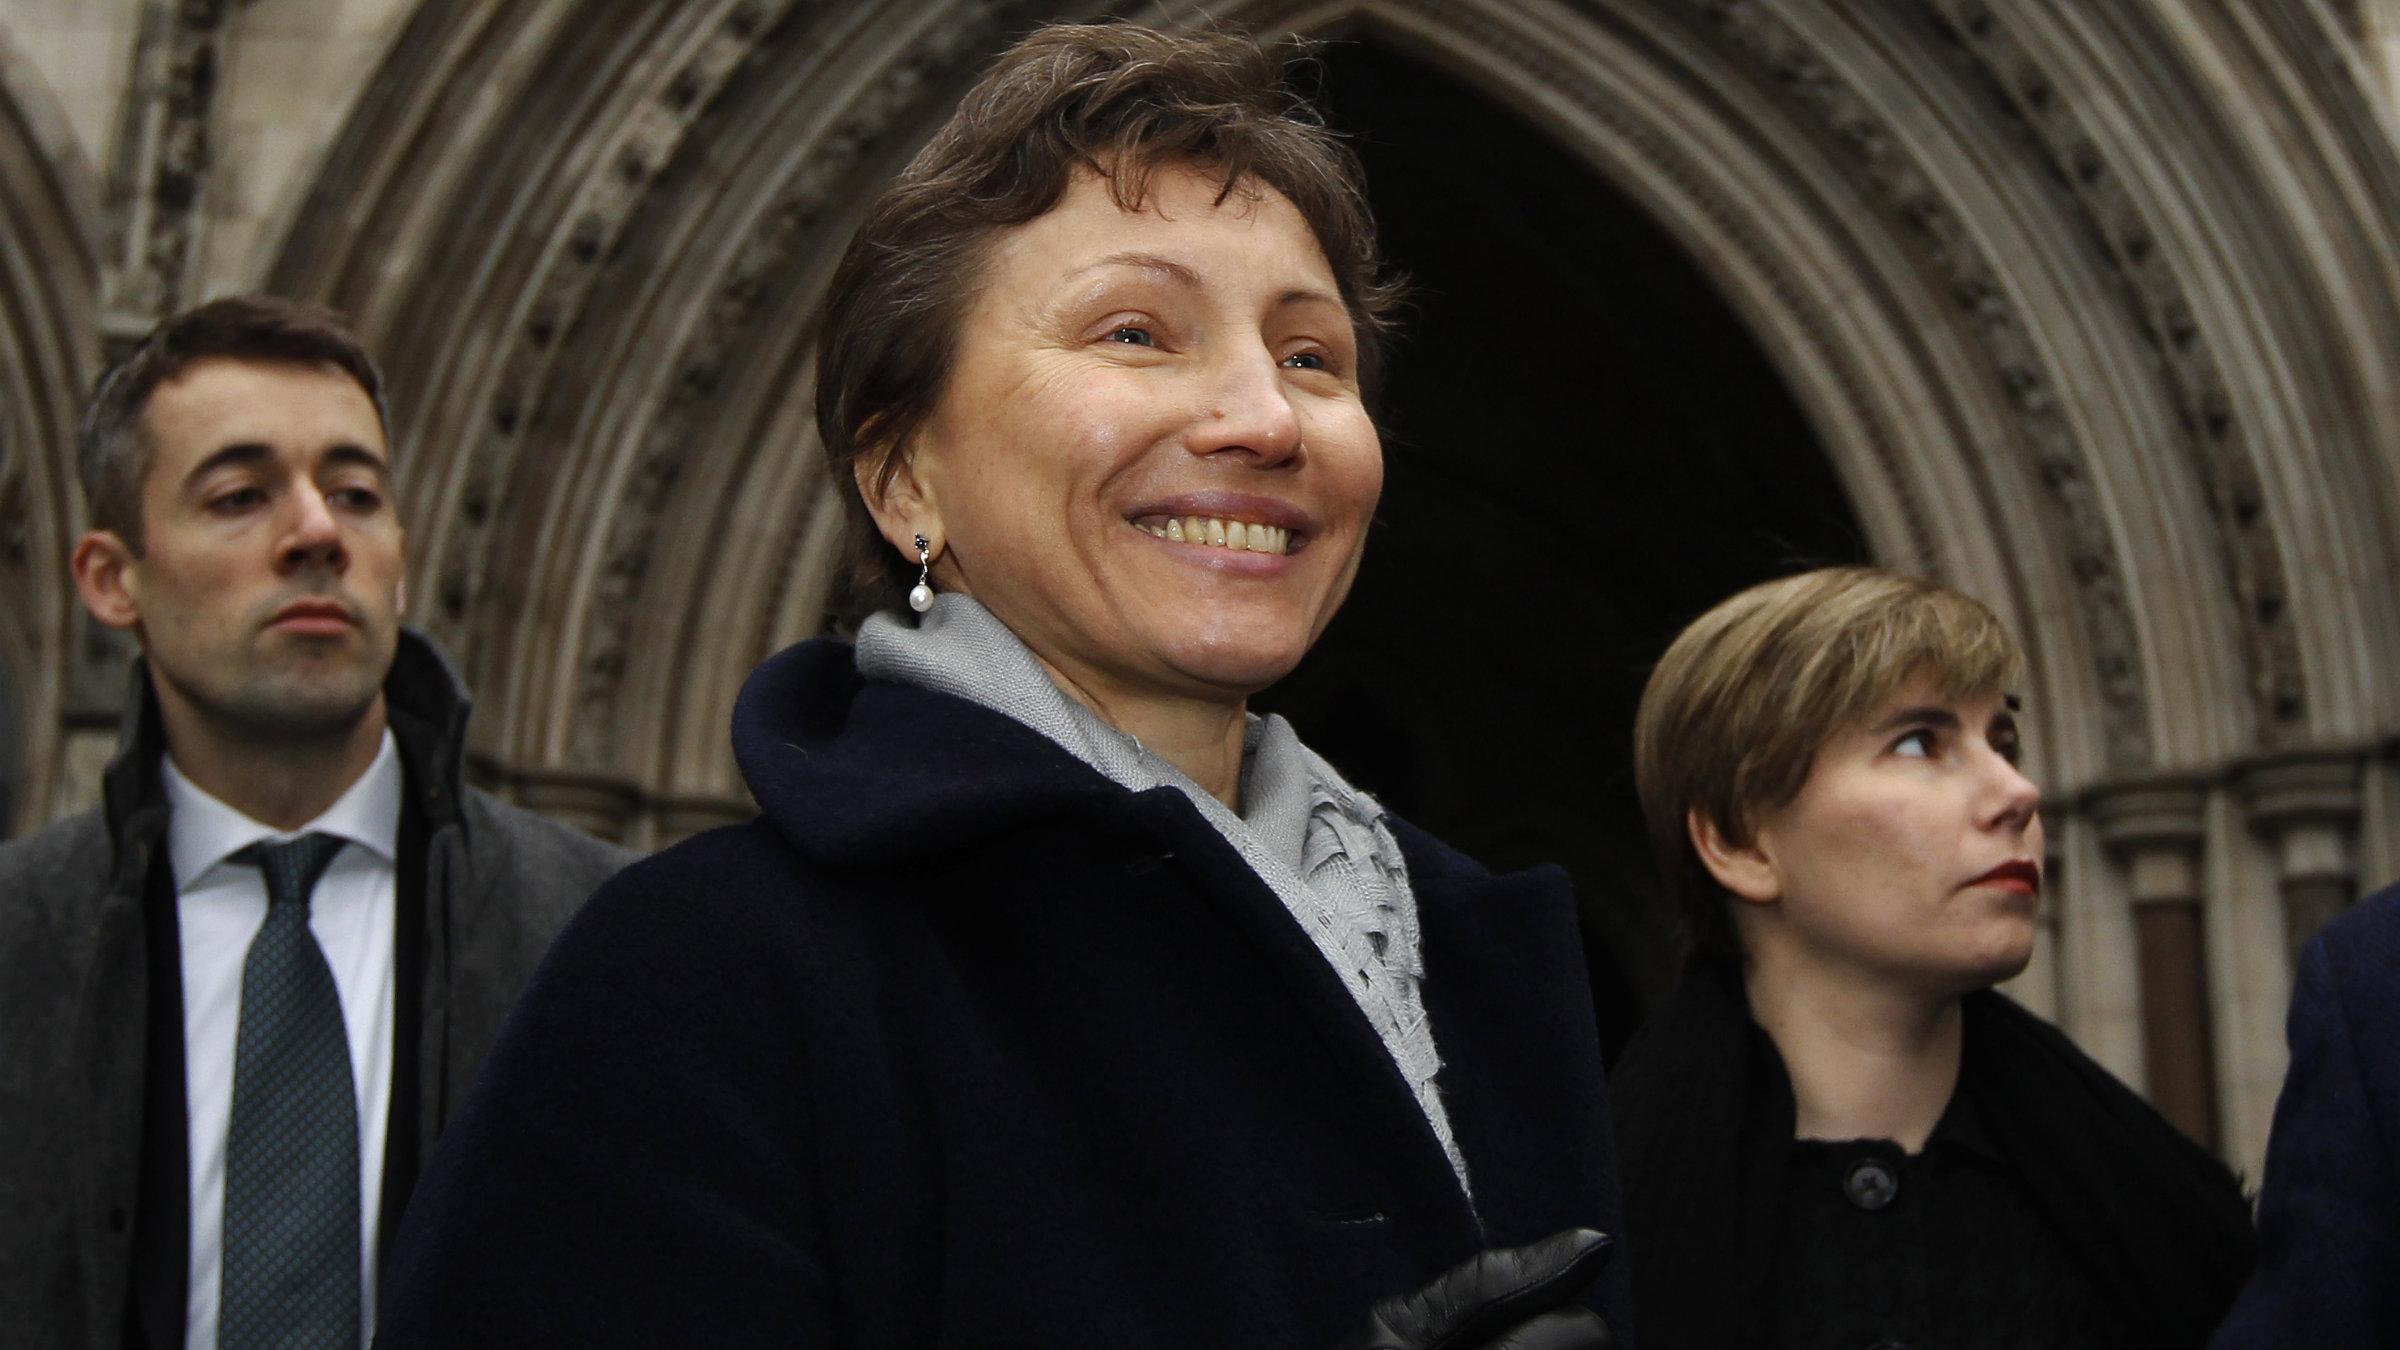 Marina Litvinenko, widow of KGB defector Alexander Litvinenko, outside the London High Court in Februrary 2013.